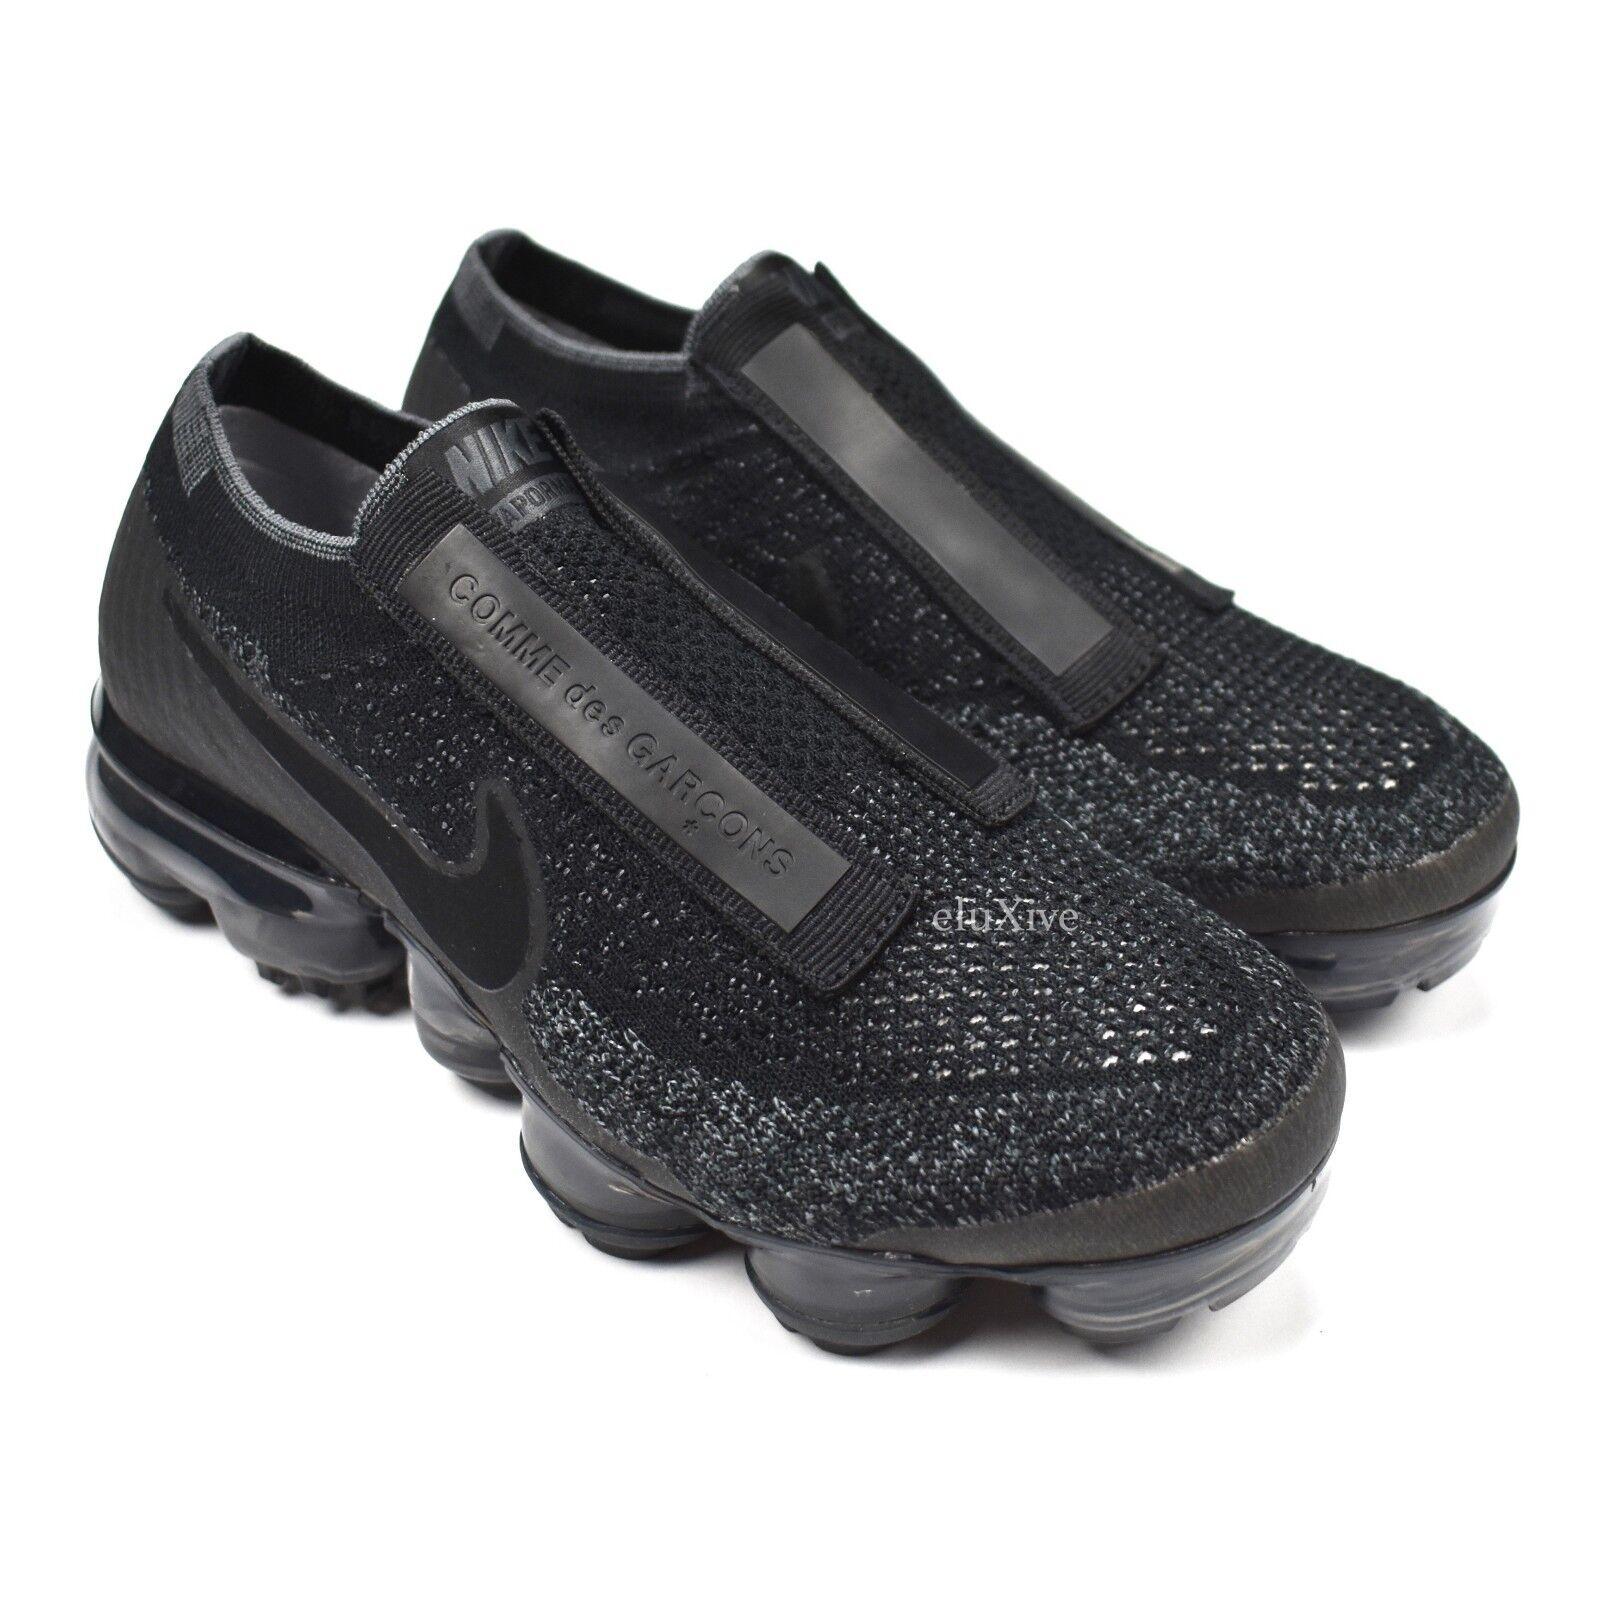 4e9f4d123e5 NWT Nike Nike Nike Comme des Garcons Air Vapormax FK CDG Triple Black  Sneakers 5 AUTHENTIC